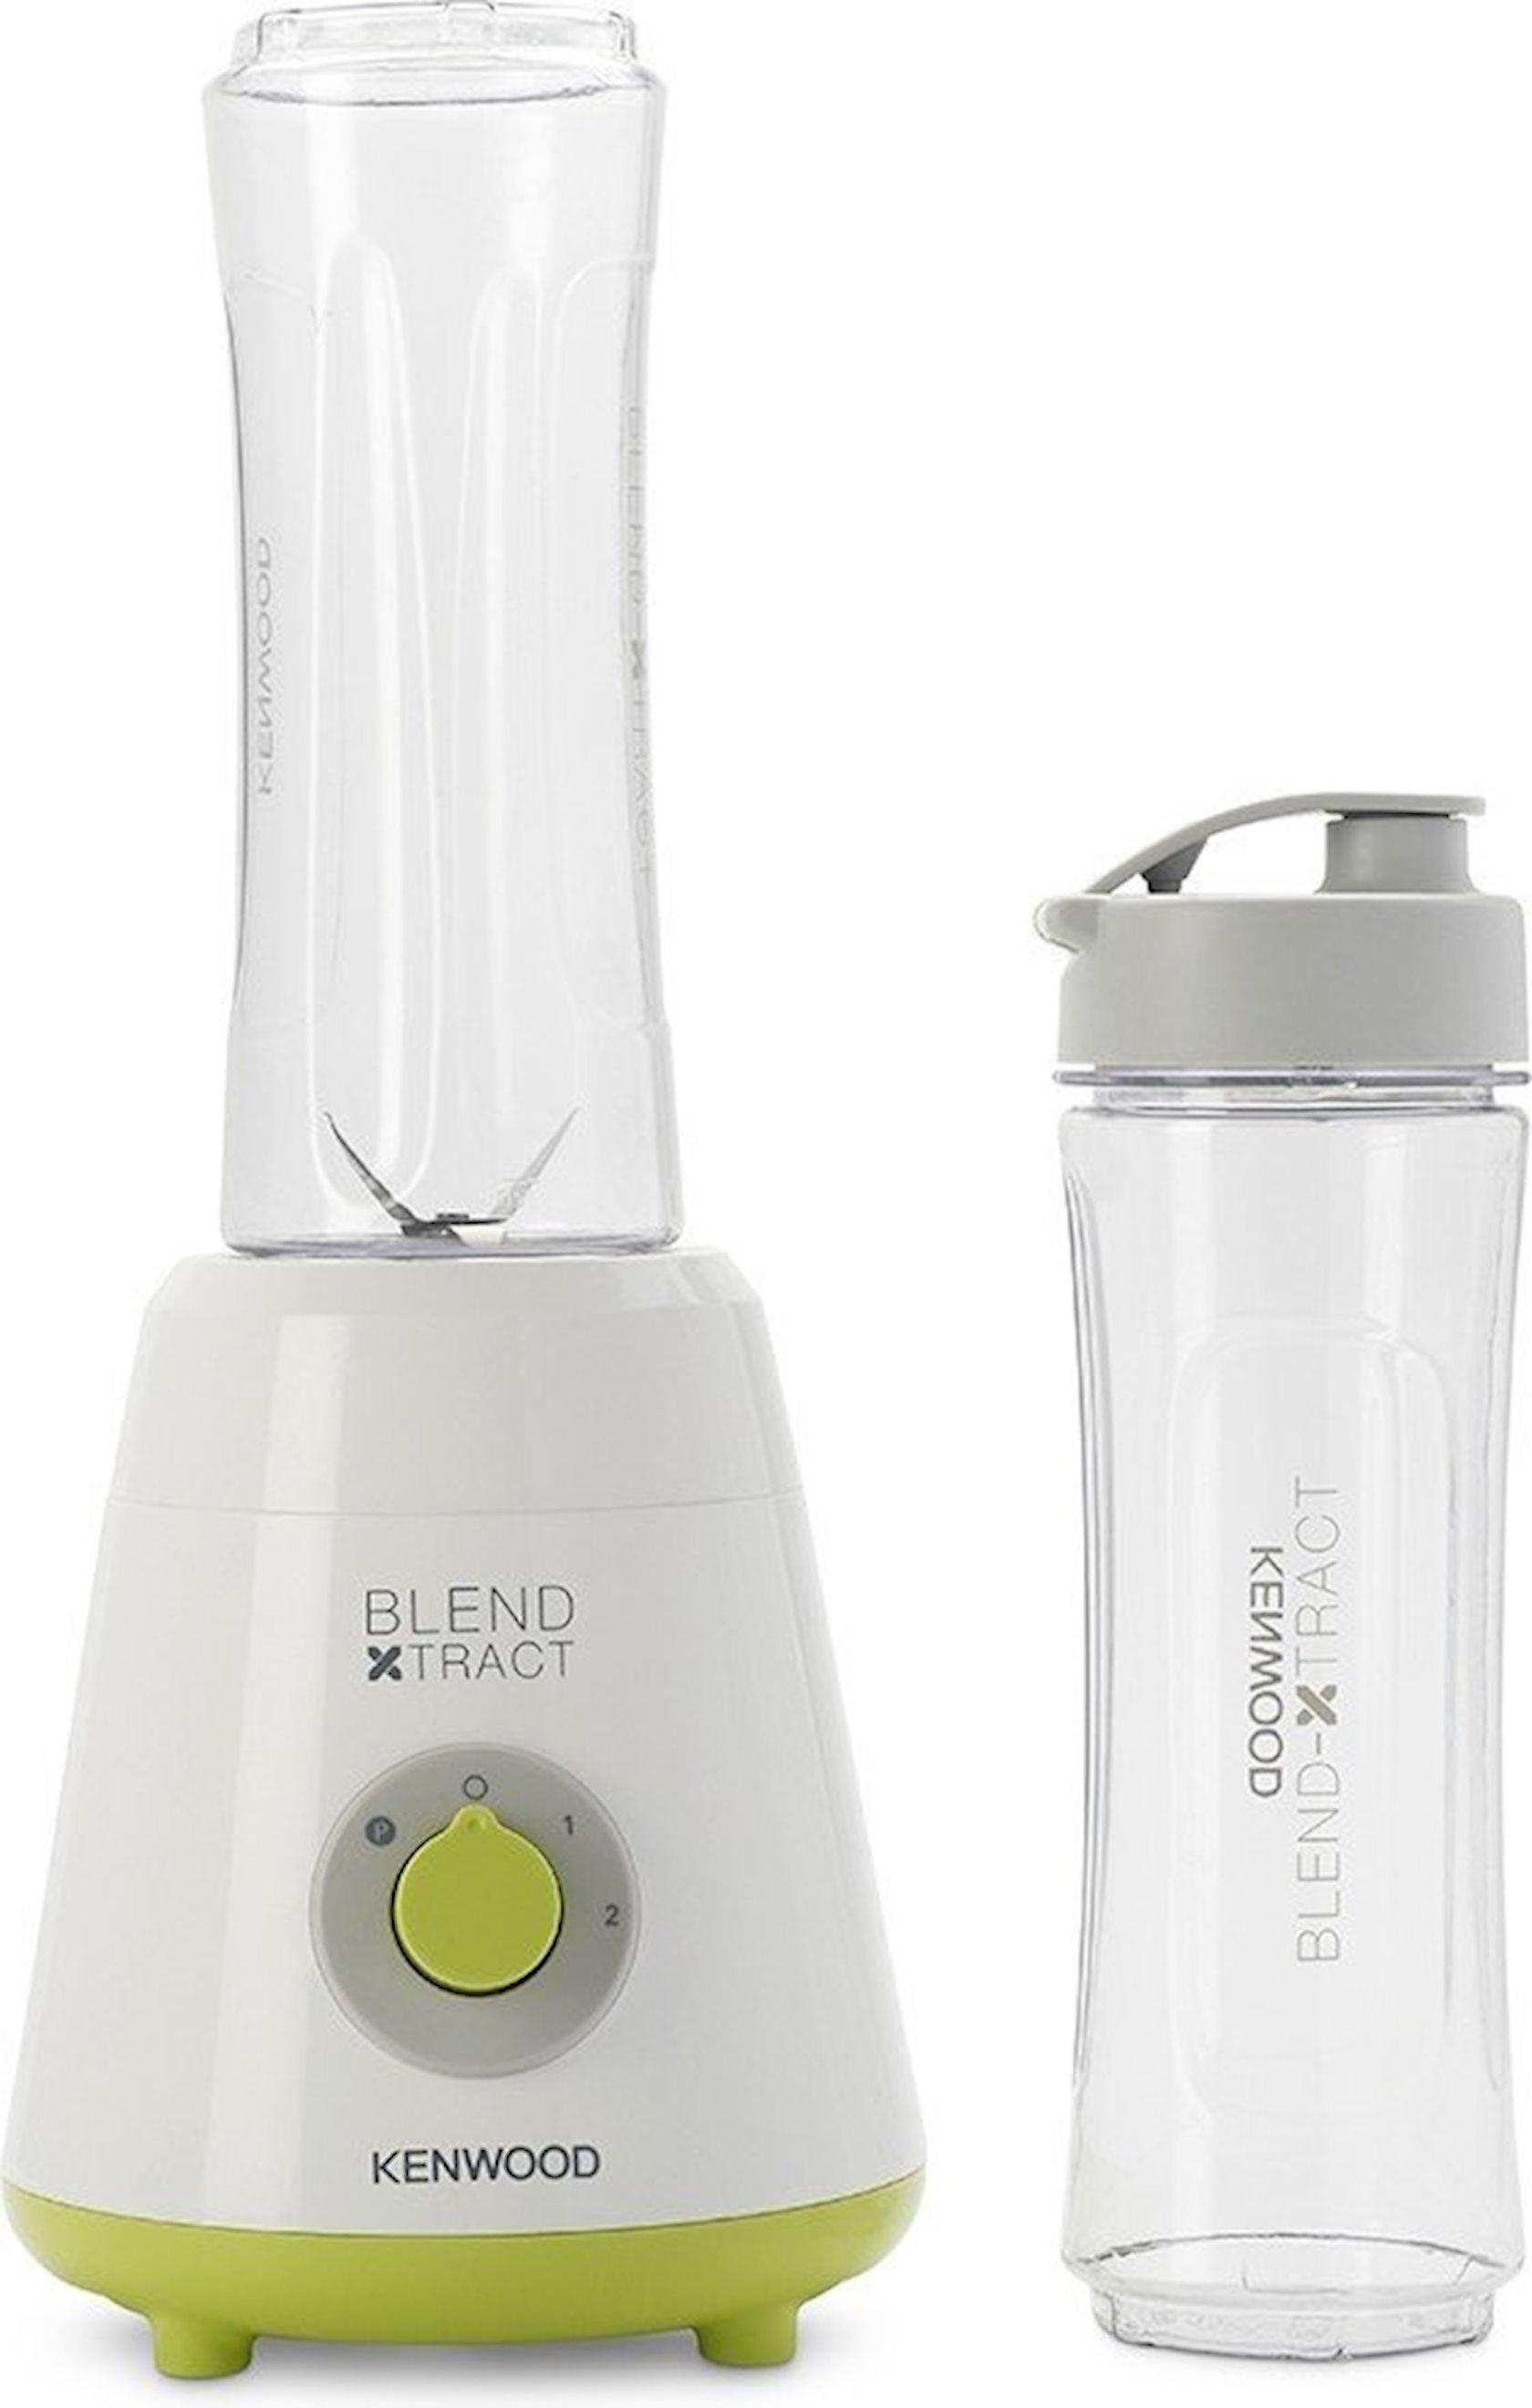 Blender Kenwood Blend-Xtract SMP060WG